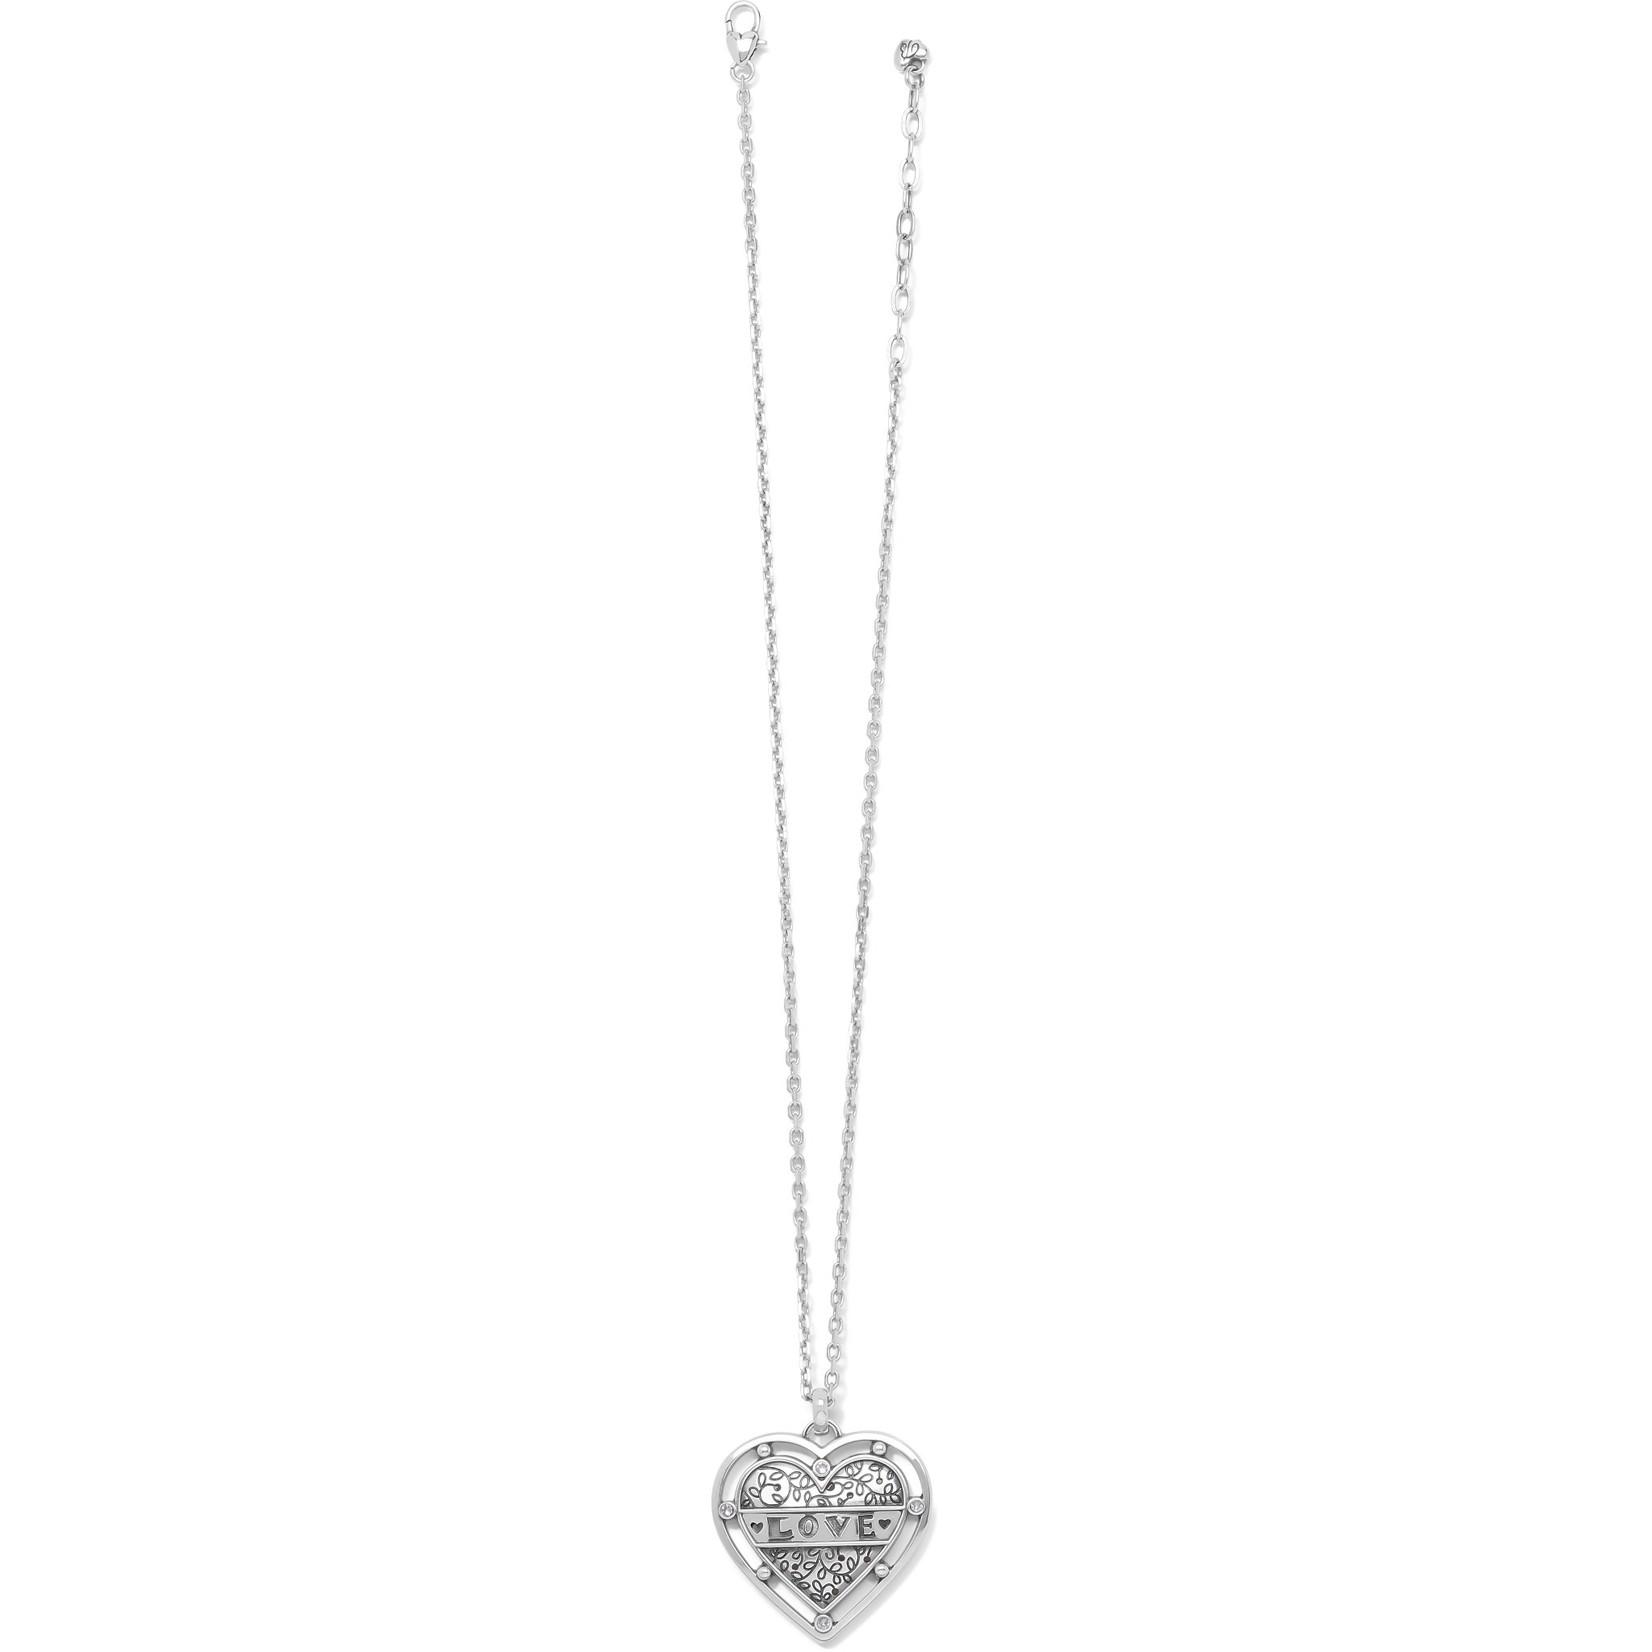 Brighton Chalice Heart Necklace